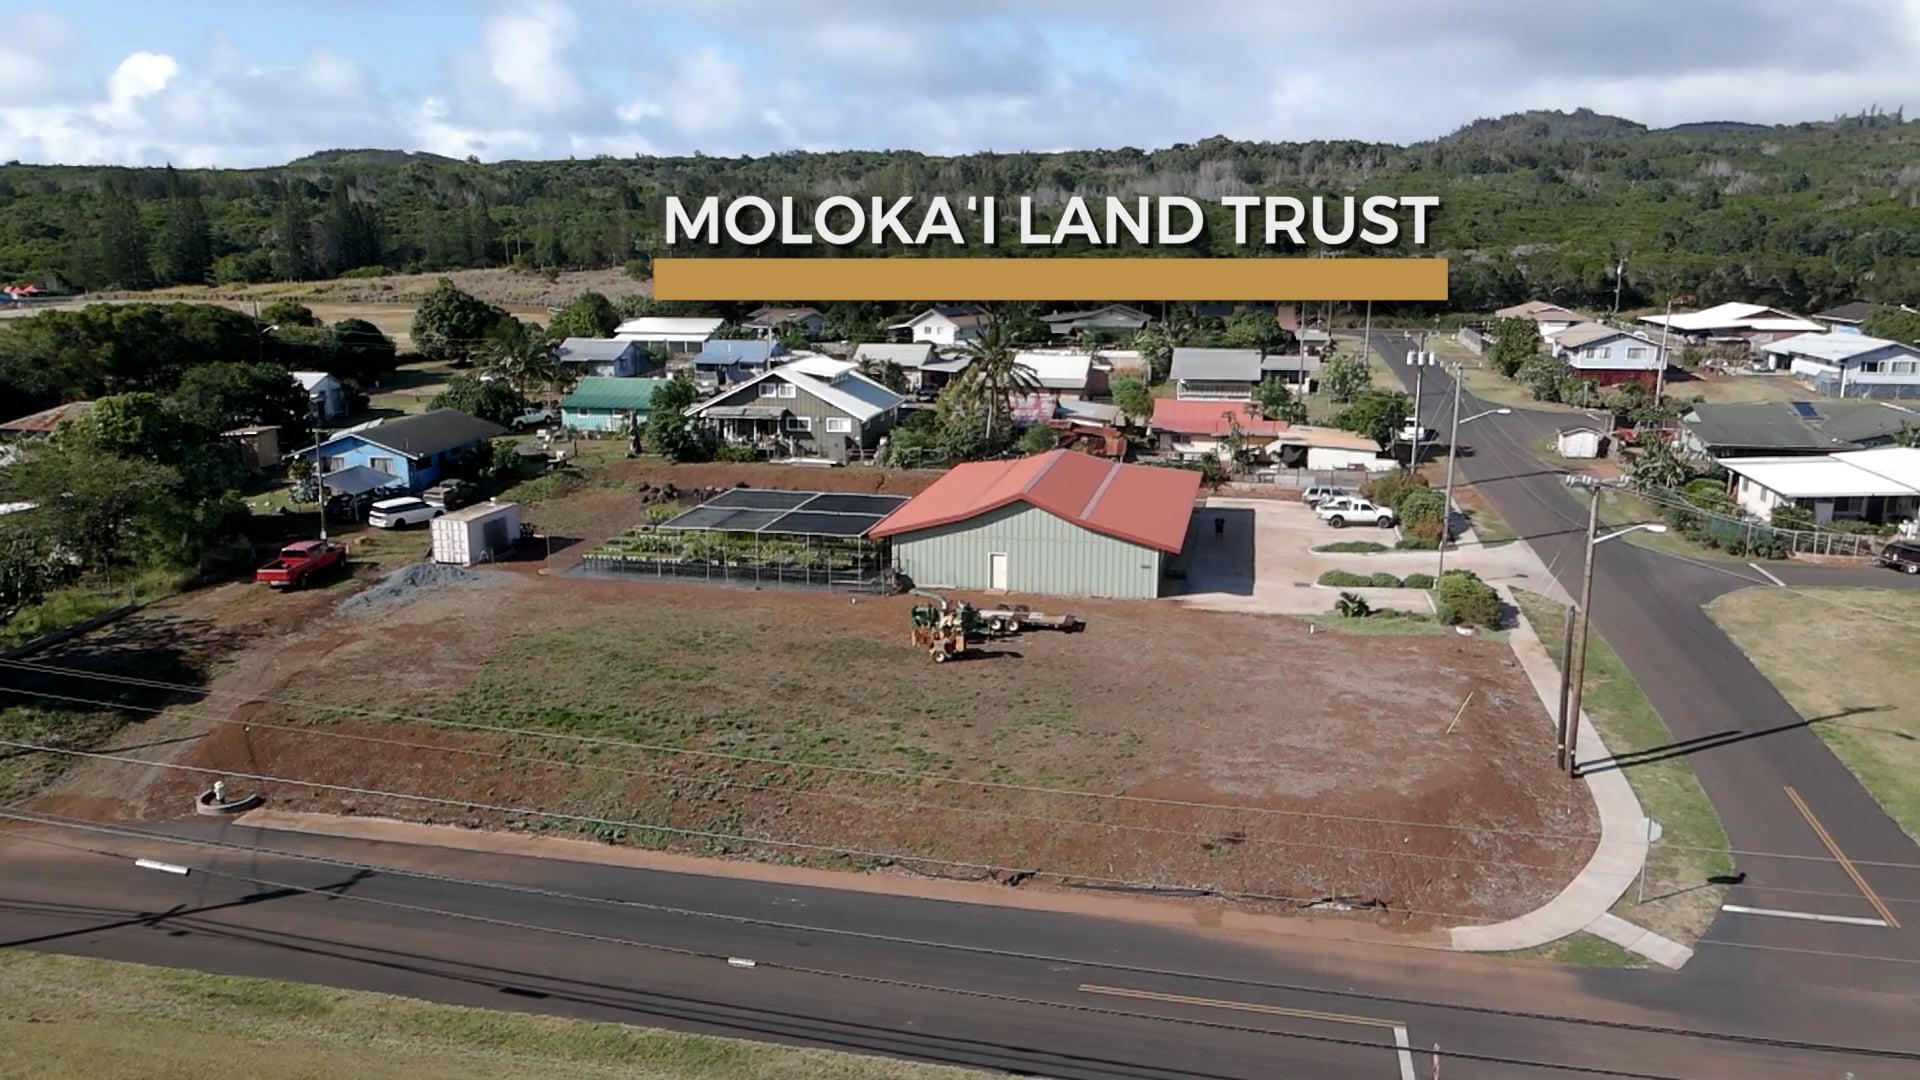 Community Restoration Partnership: Moloka'i Land Trust